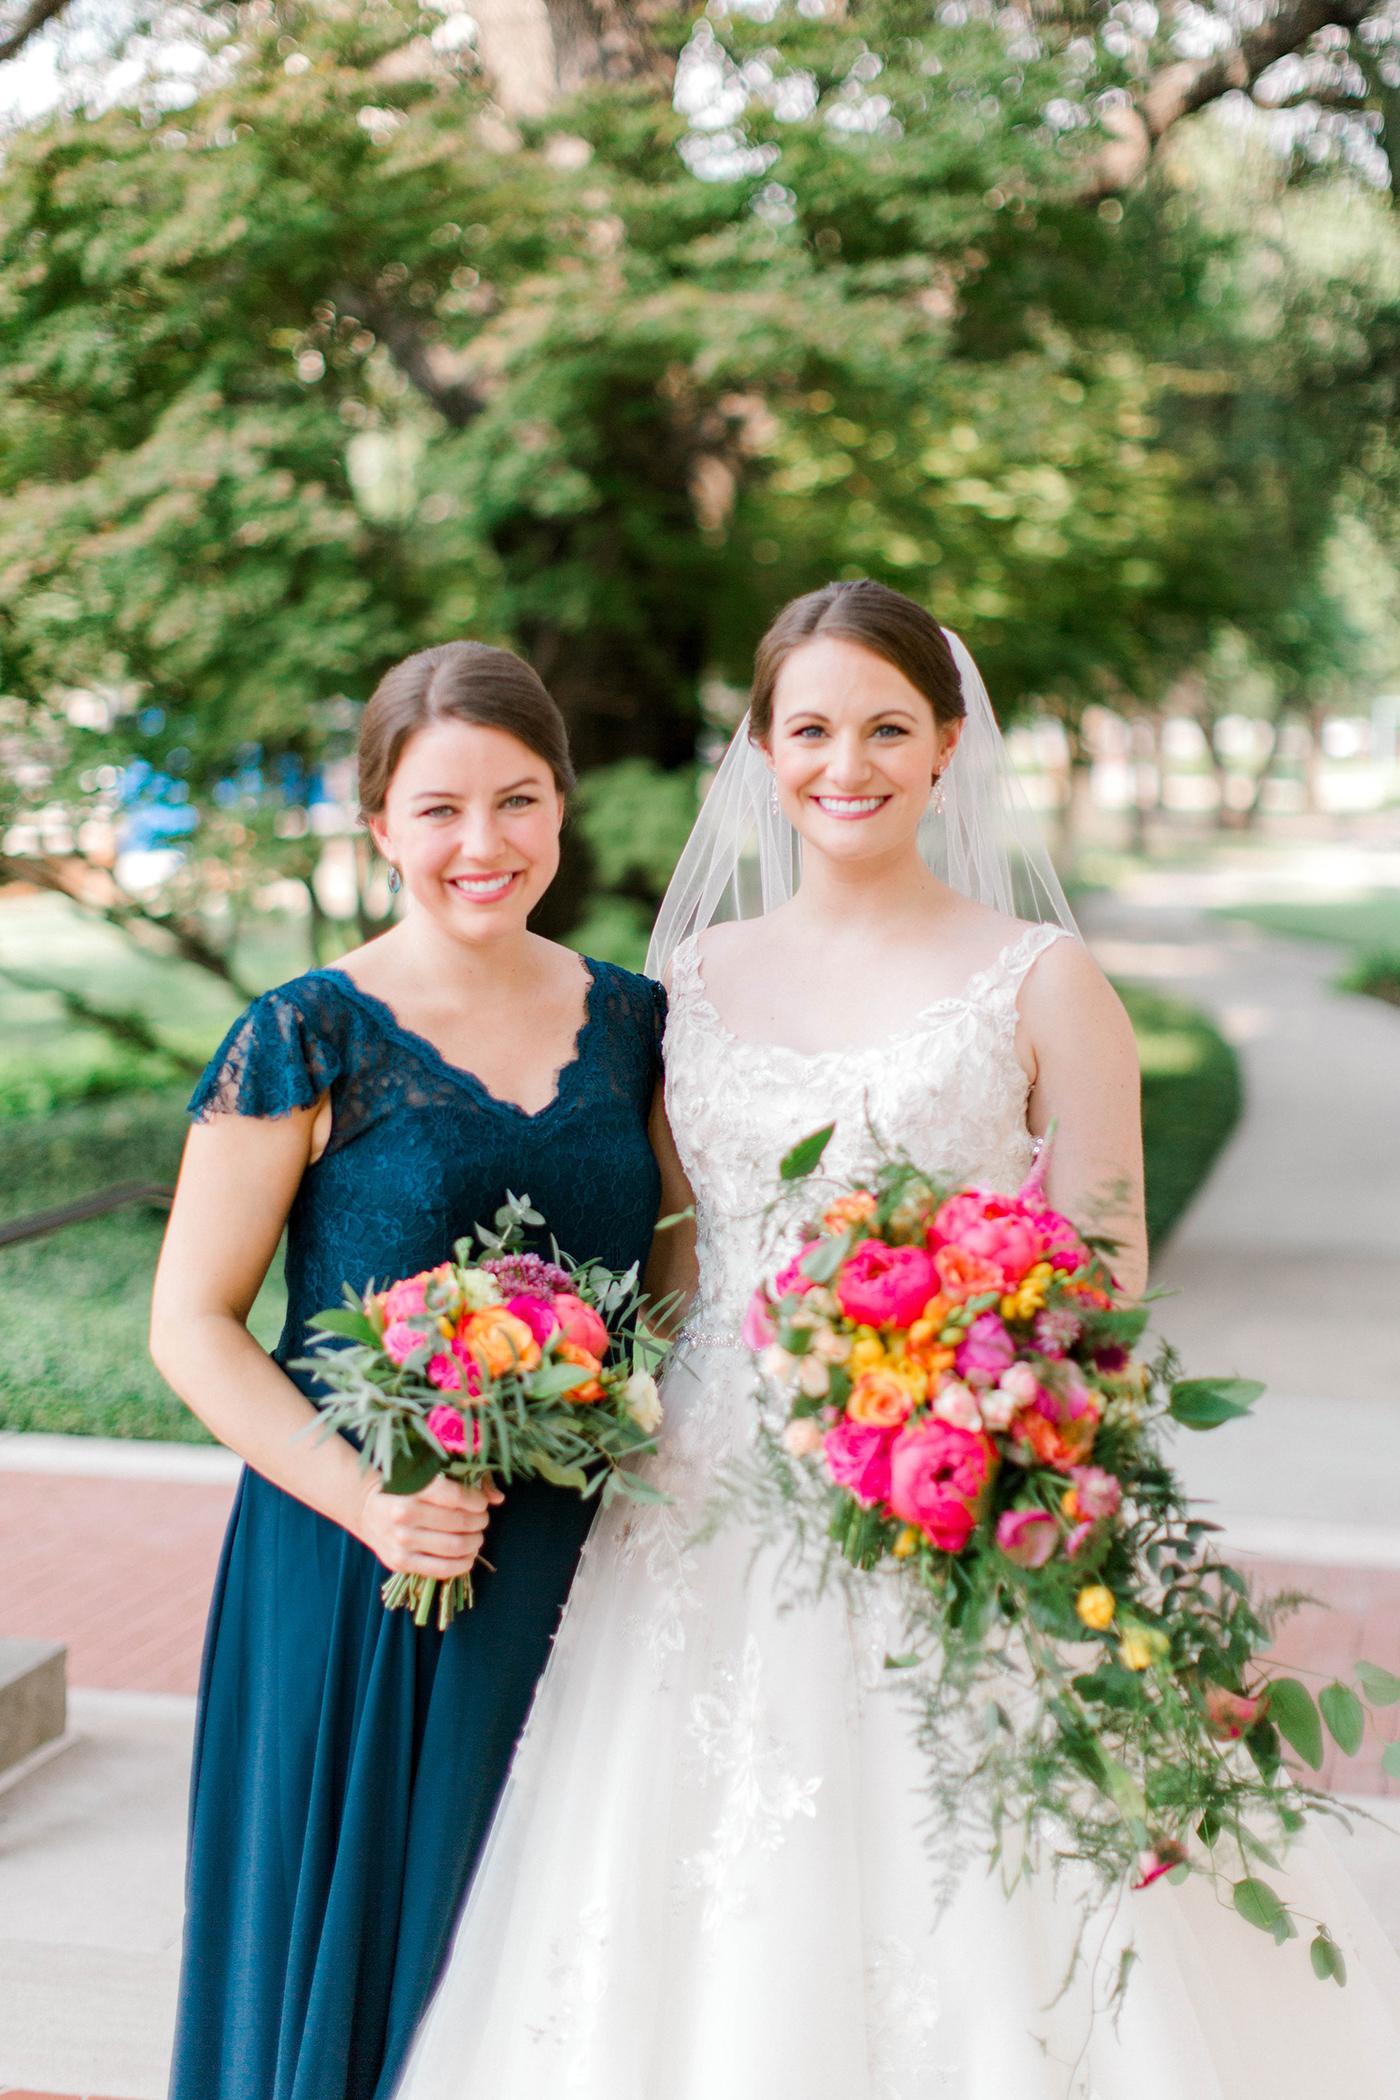 Dallas TX Wedding Planner - Allday Events - Hall on Dragon Wedding - 00039.jpg